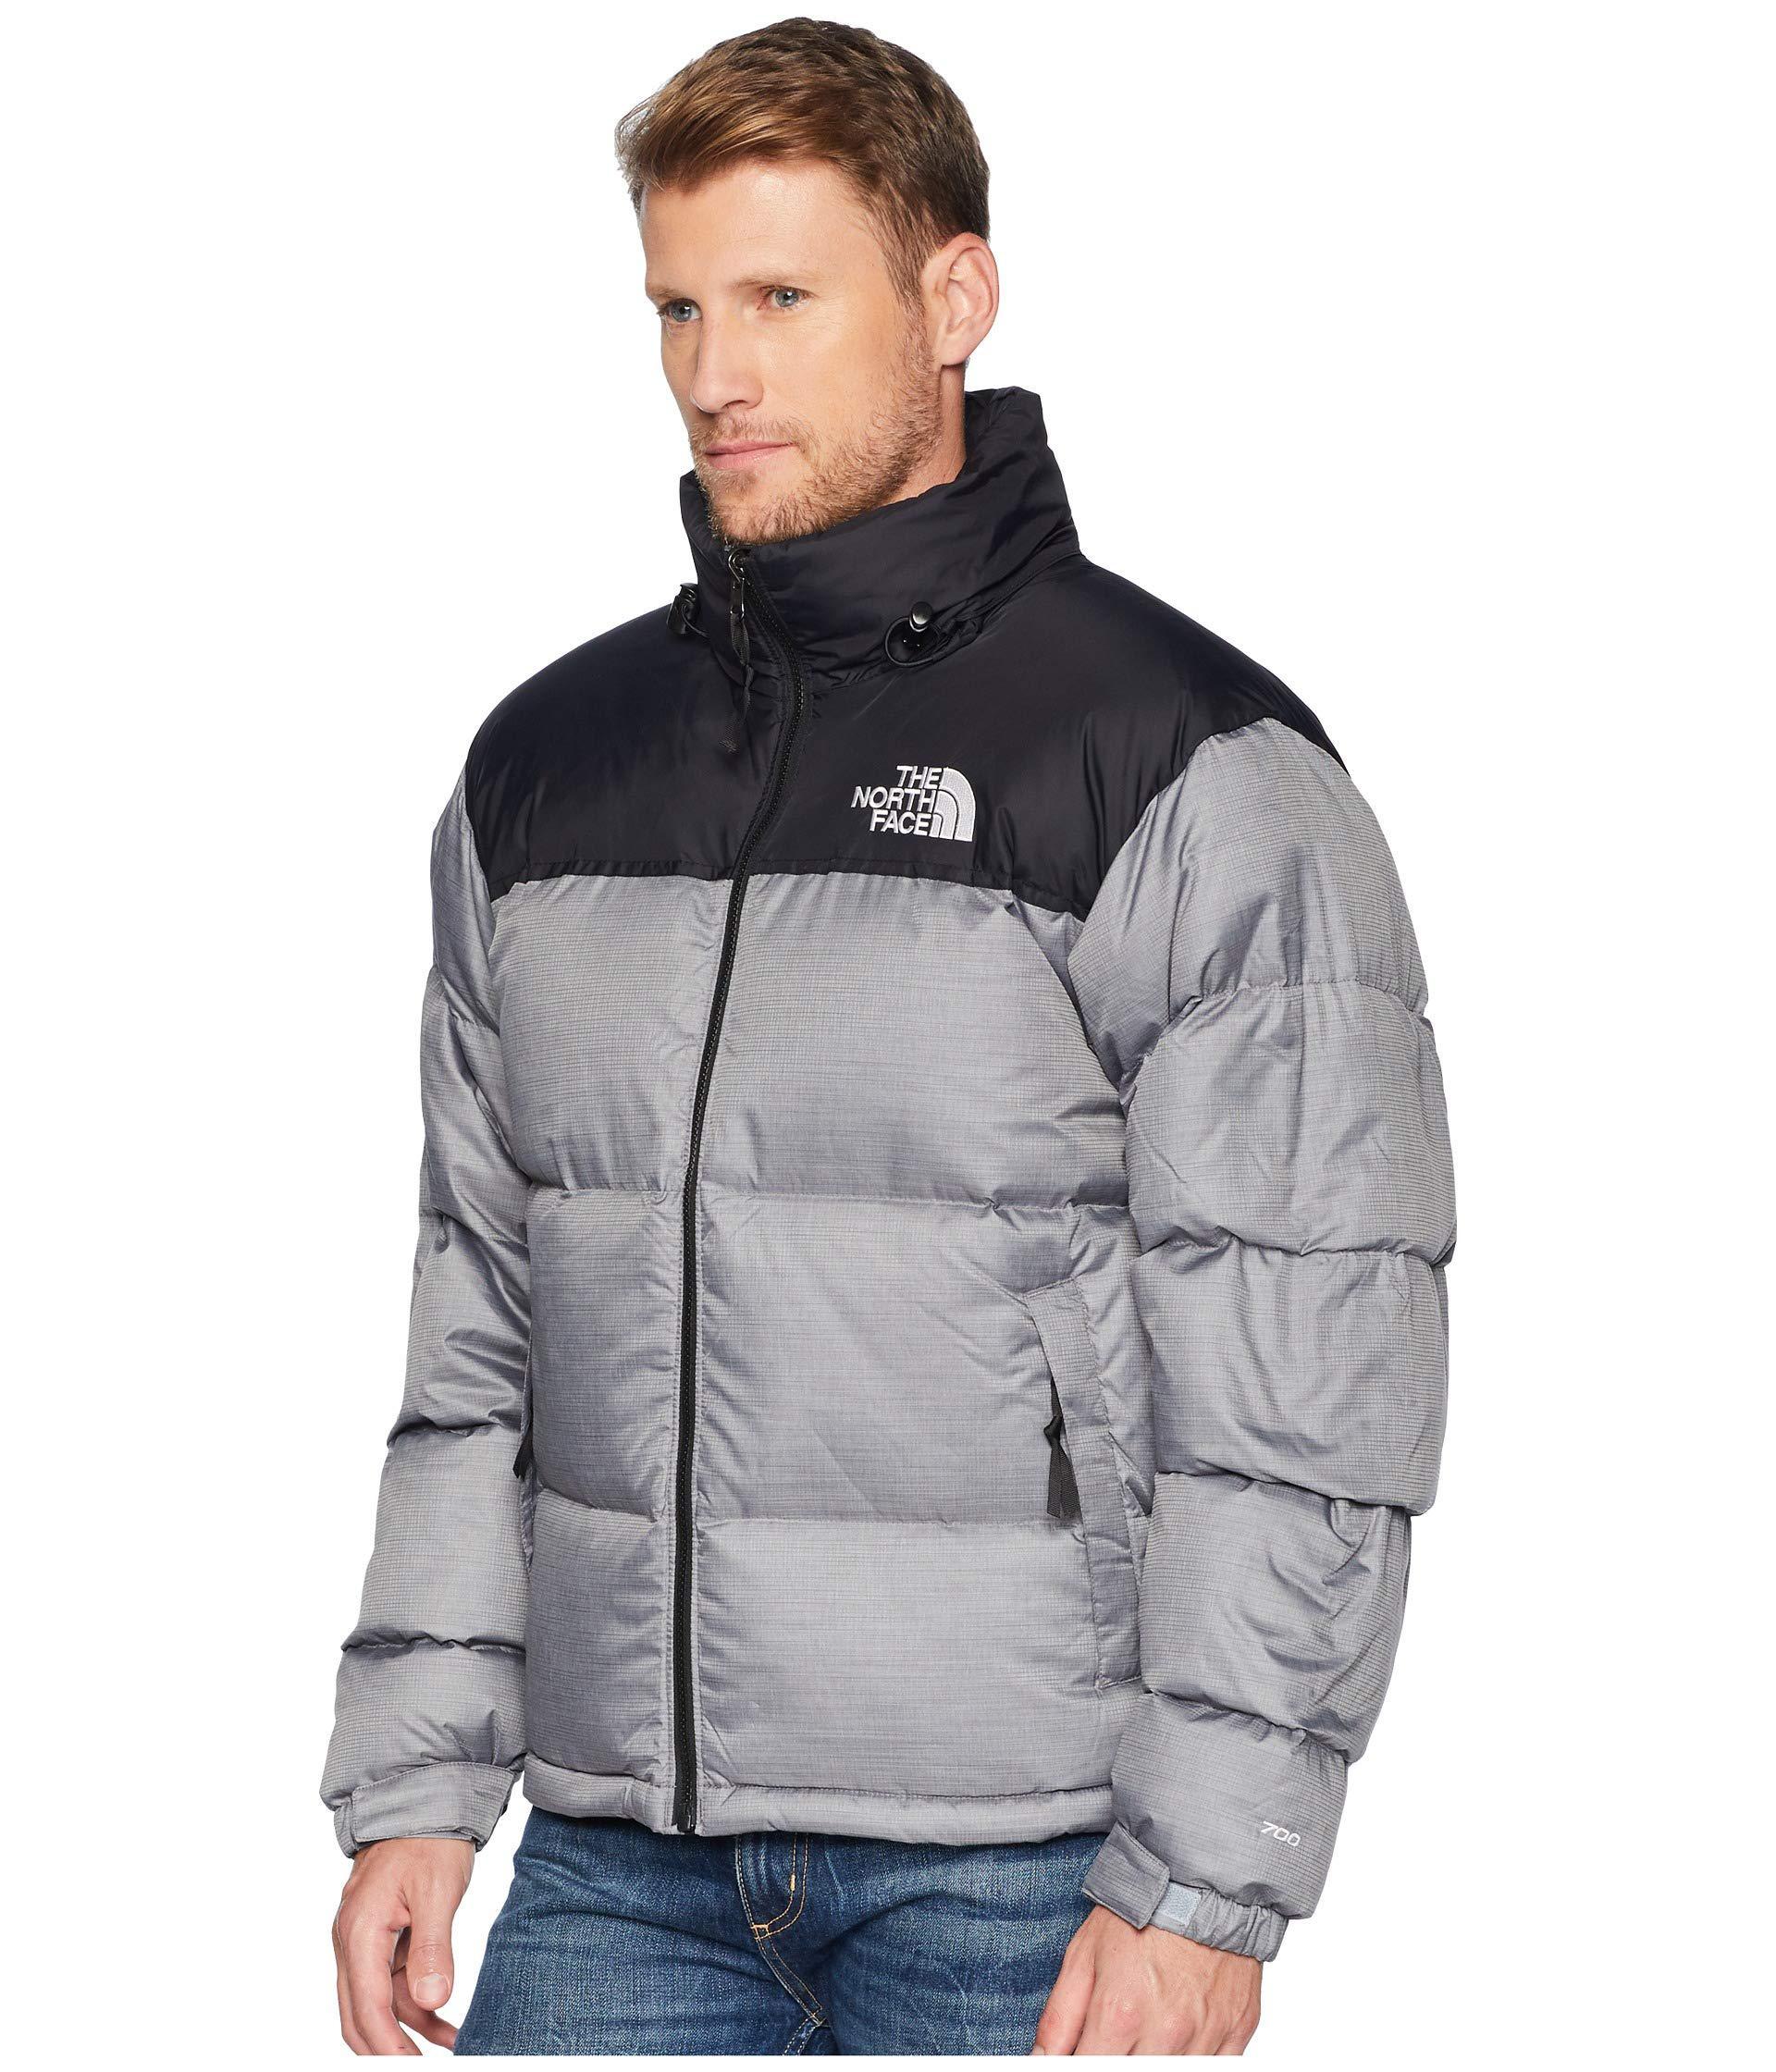 Lyst - The North Face 1996 Nuptse Jacket (tnf Medium Grey Heather) Men s  Coat in Gray for Men 081d52ea5